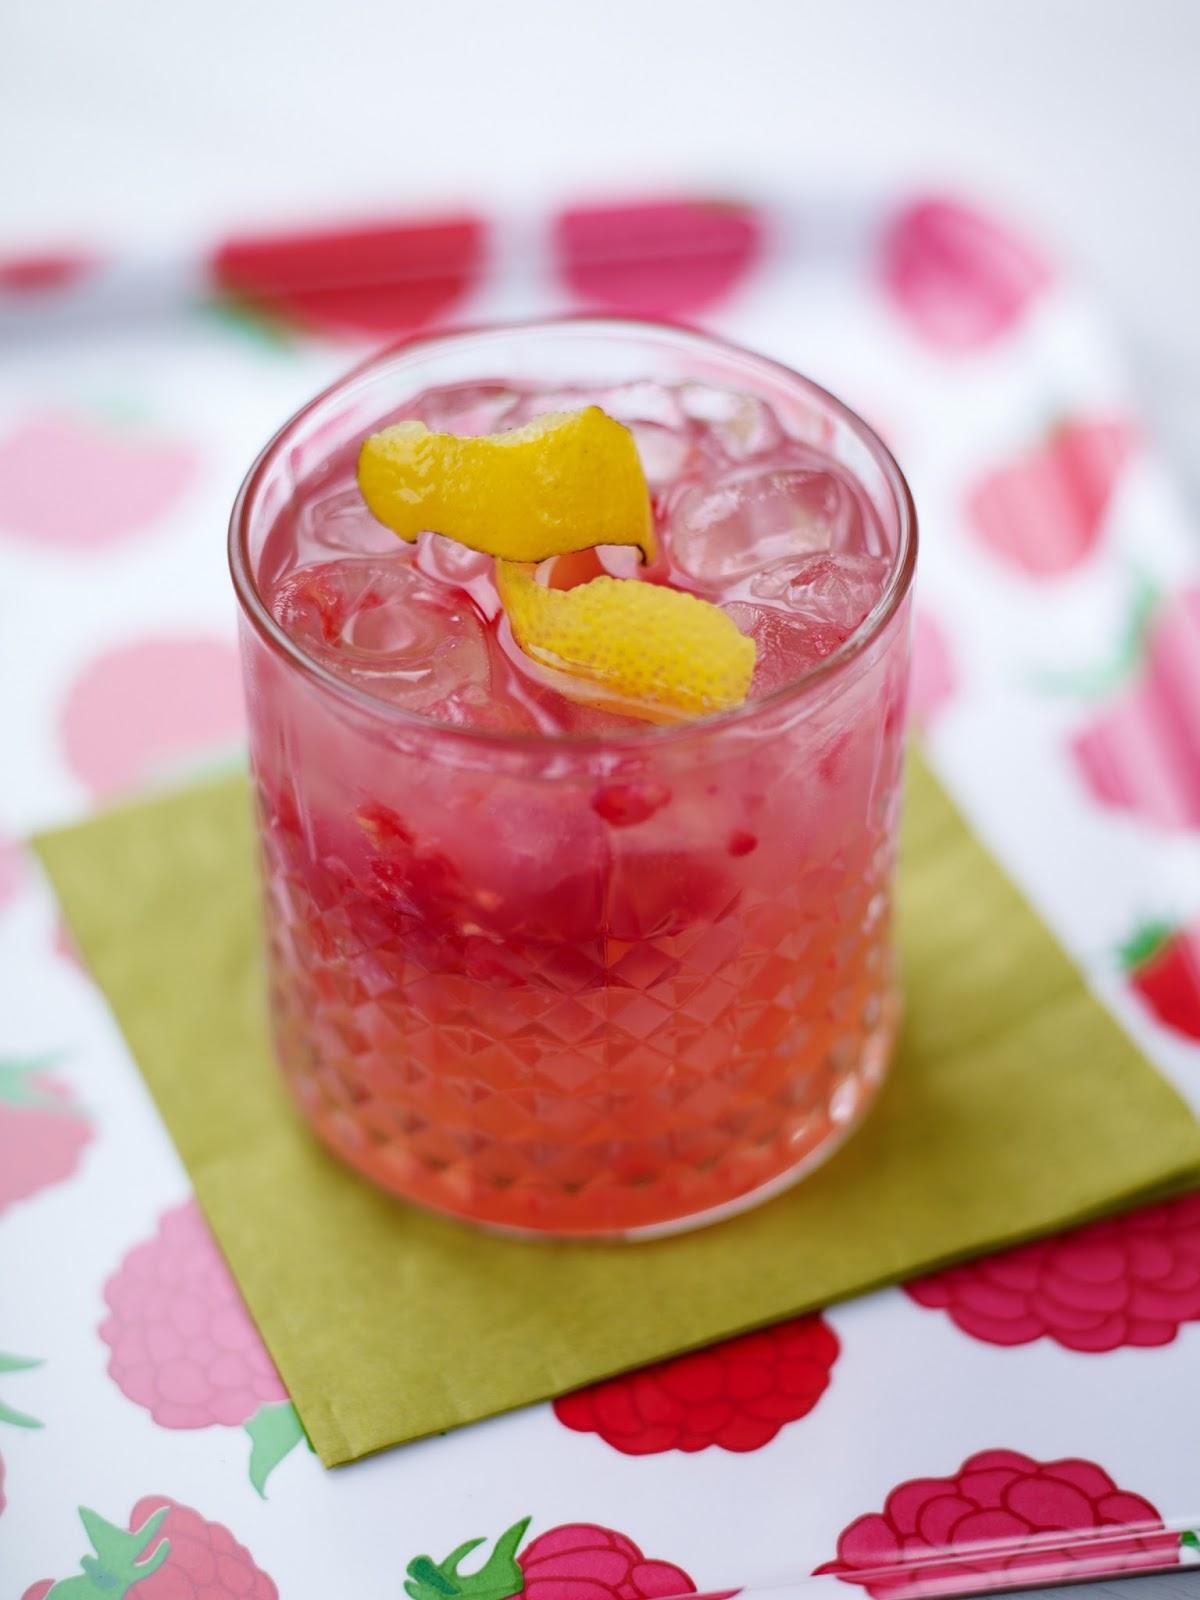 Joe Wadsack's Pink Rock Collins: Gin Time?